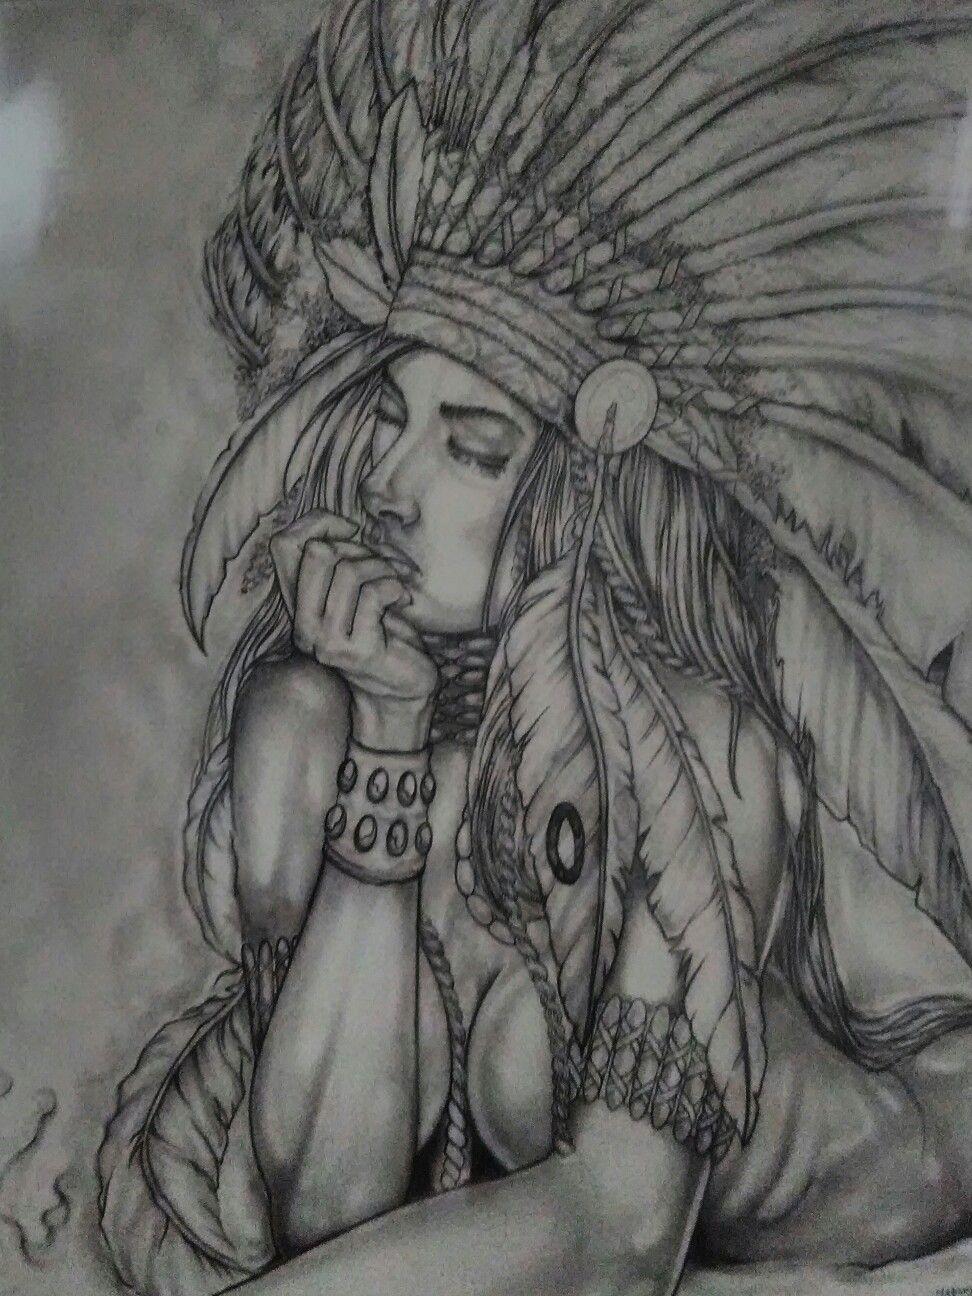 Indian girl pencil drawings native american